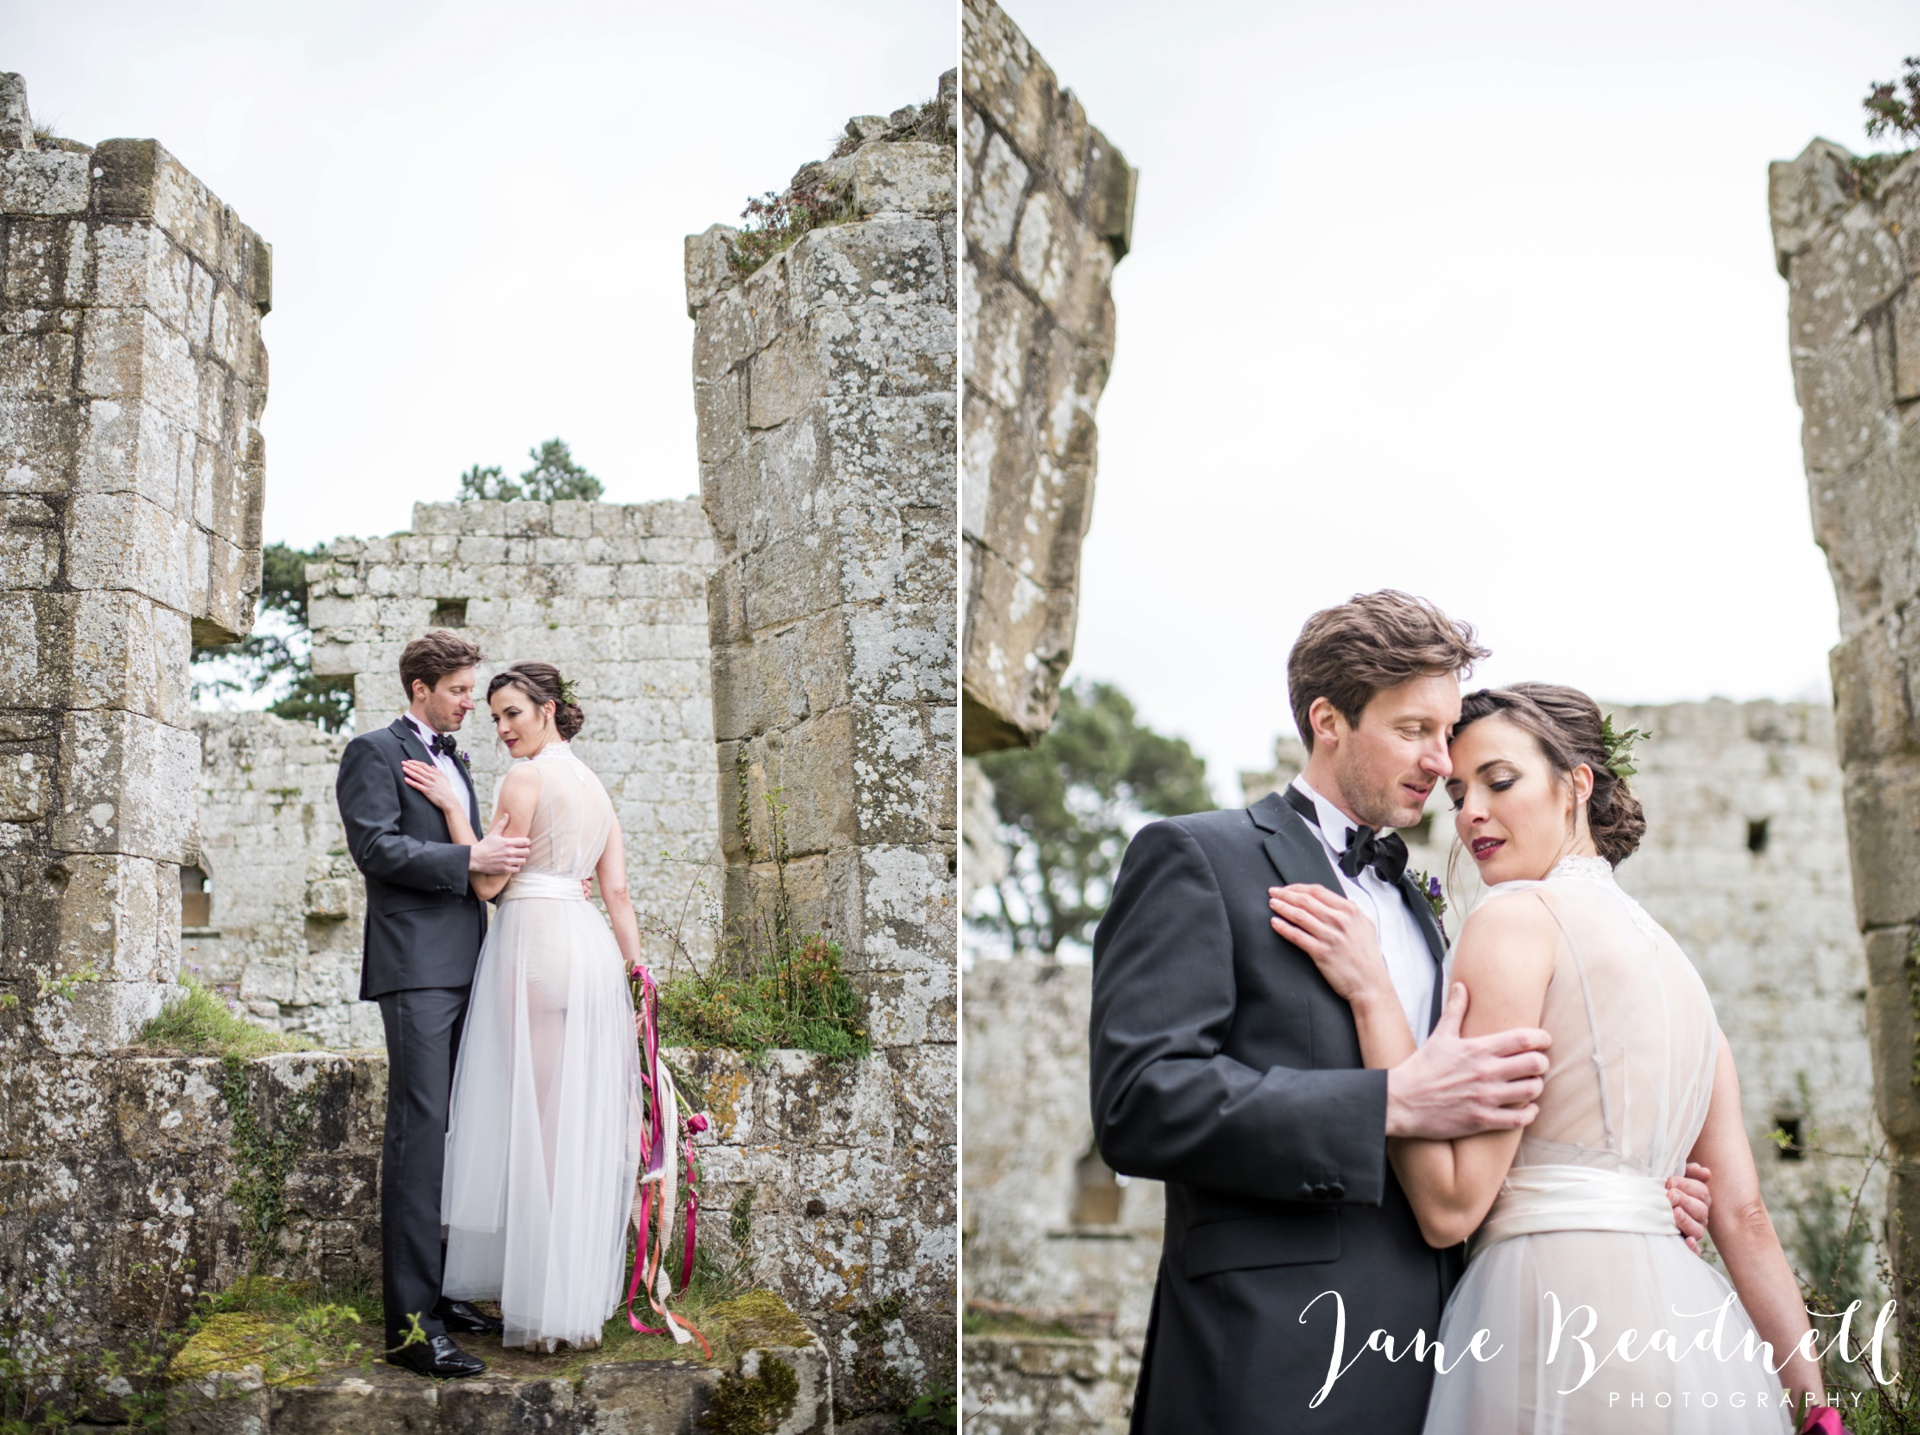 Jervaulx Abbey wedding photography fine art Yorkshire wedding photographer jane beadnell_0039